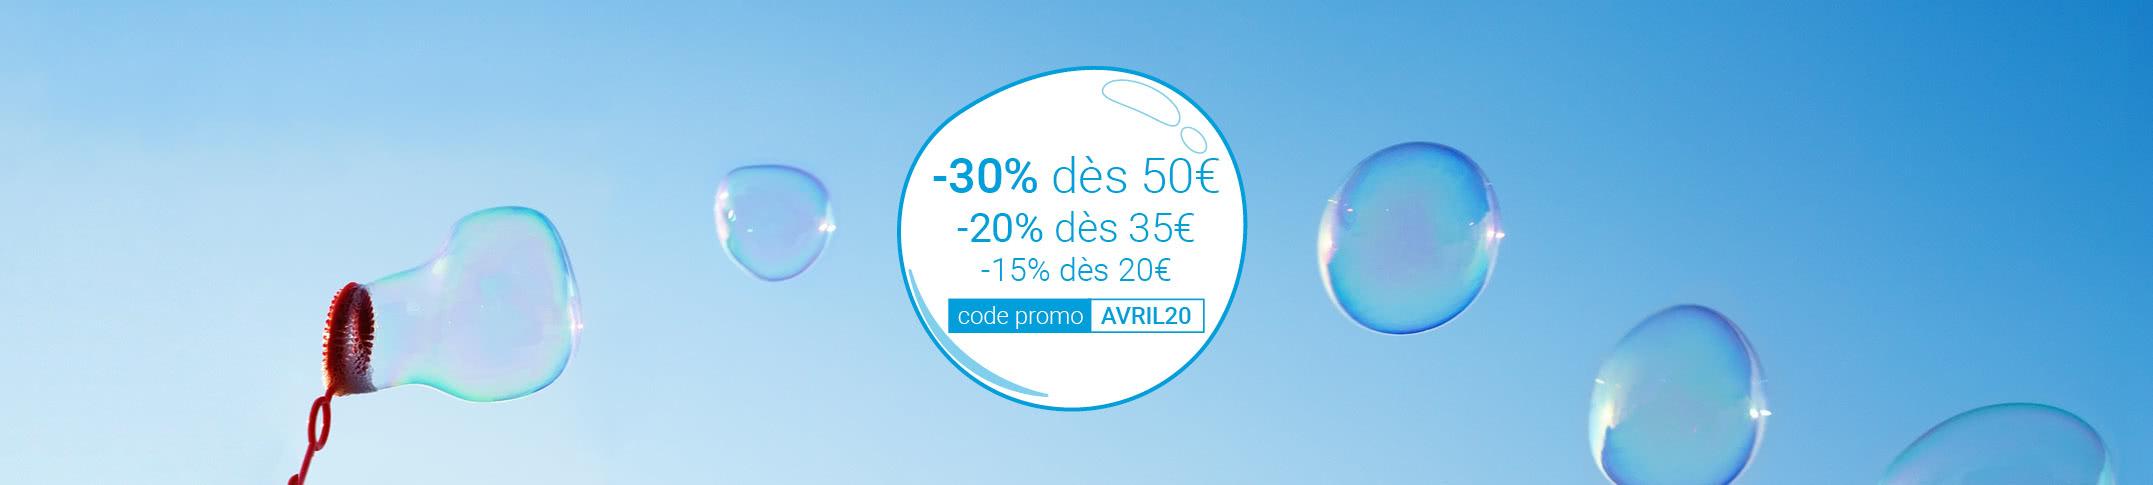 Offre du mois d'avril 2020 smartphoto france